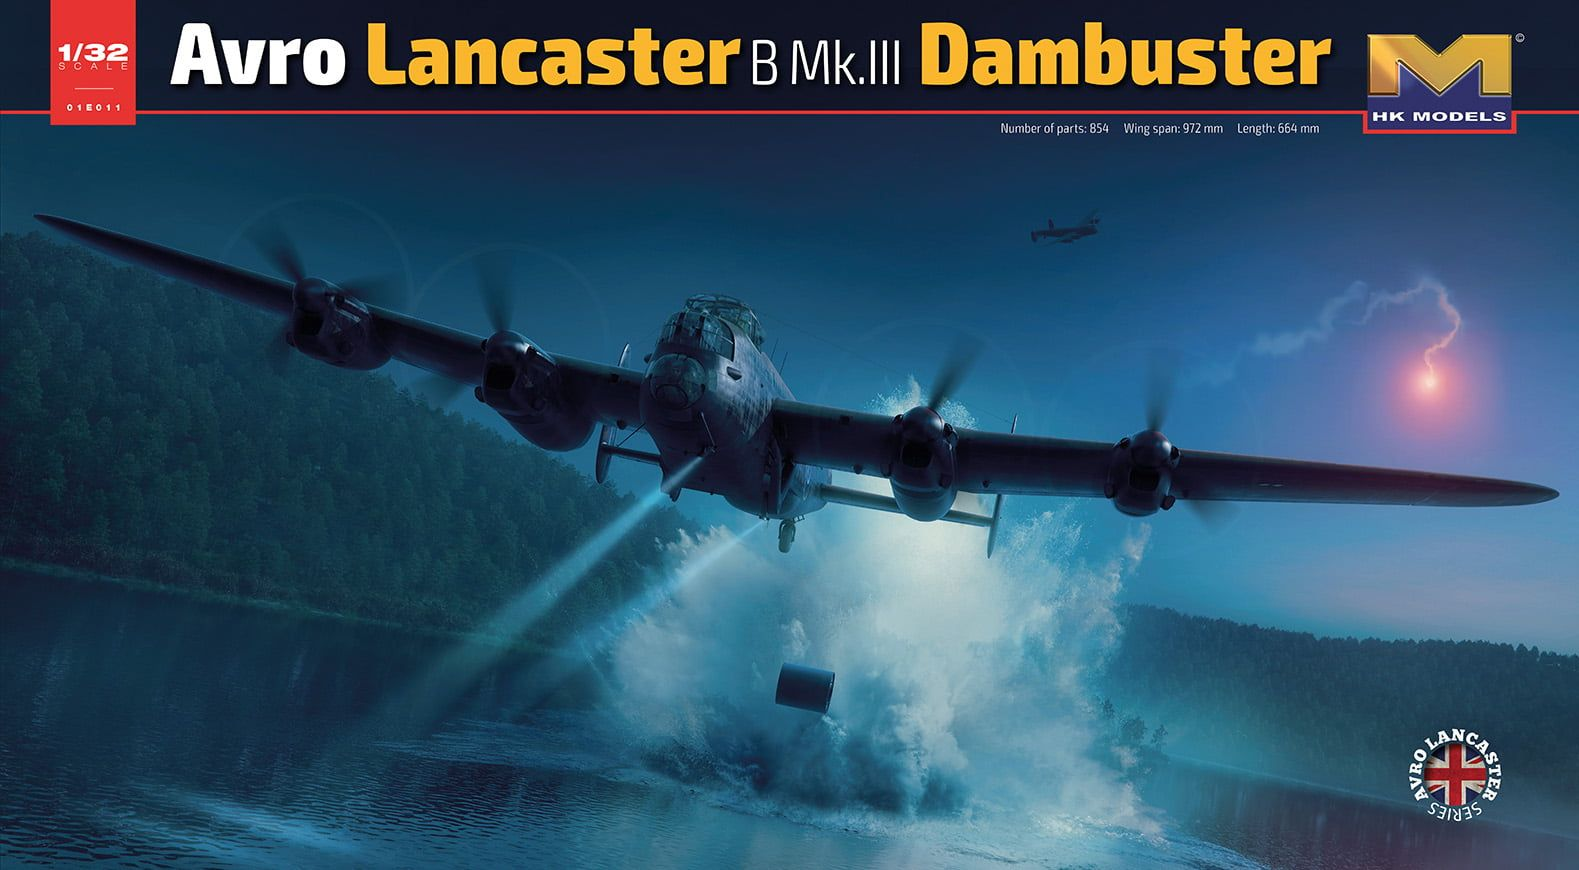 HK Models Avro Lancaster B Mk.III Dambuster